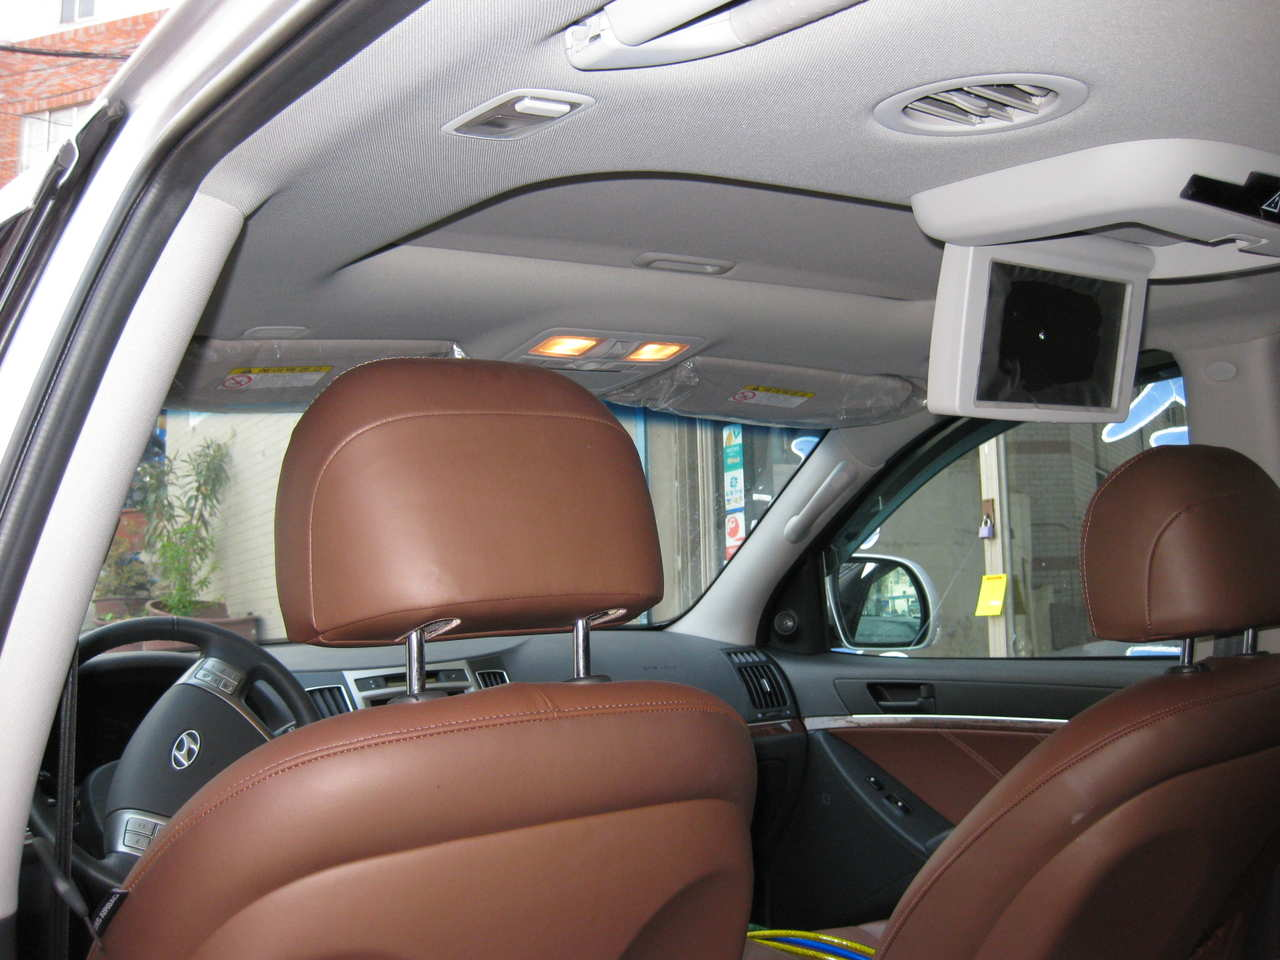 2009 Hyundai Veracruz Pics 3 0 Diesel Automatic For Sale